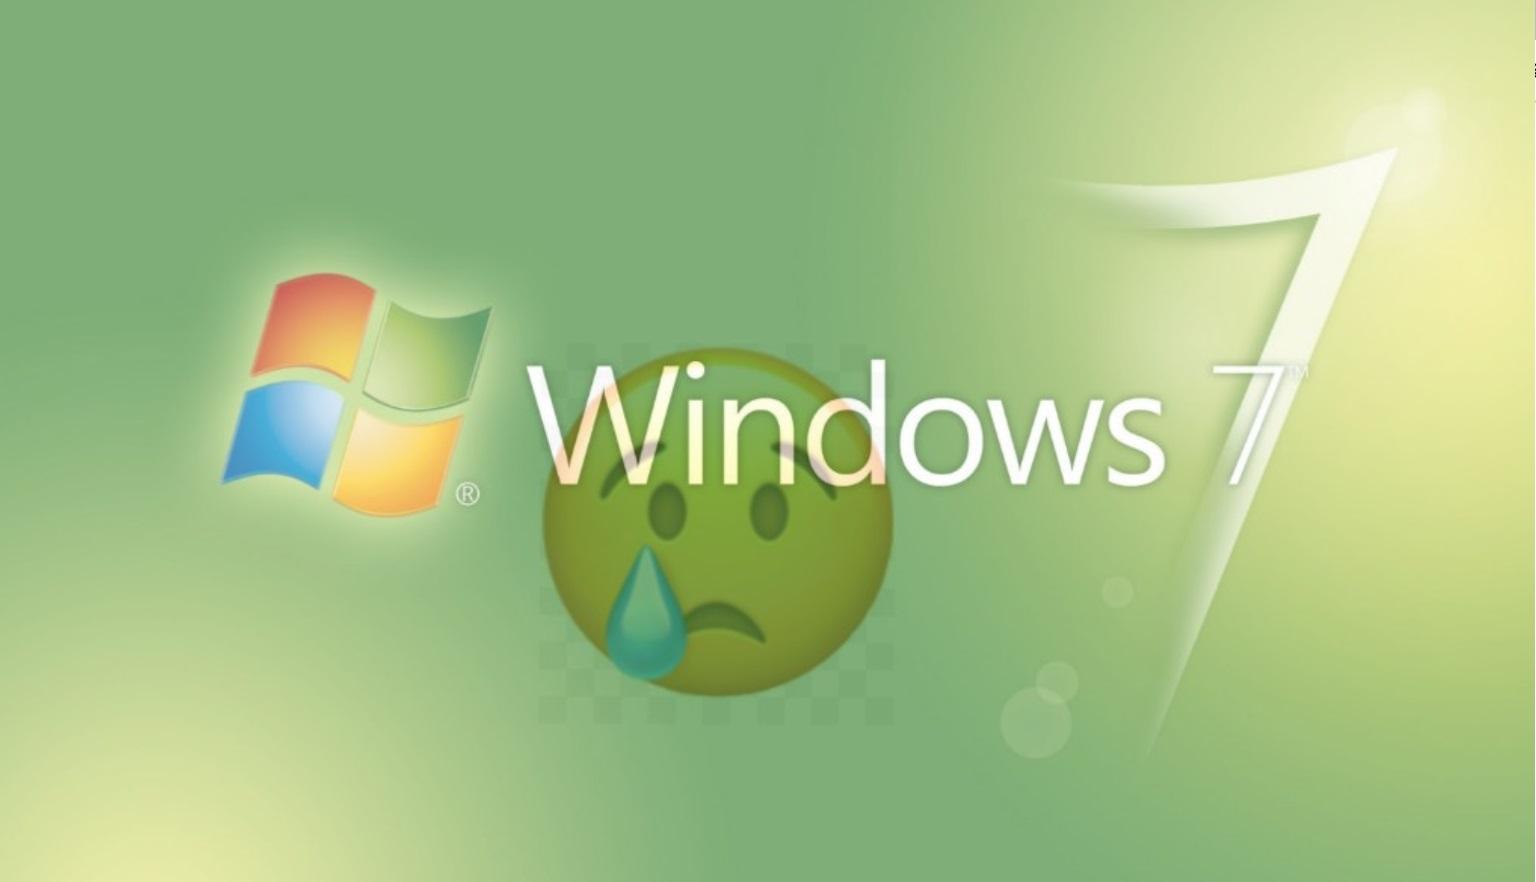 no Windows 10!